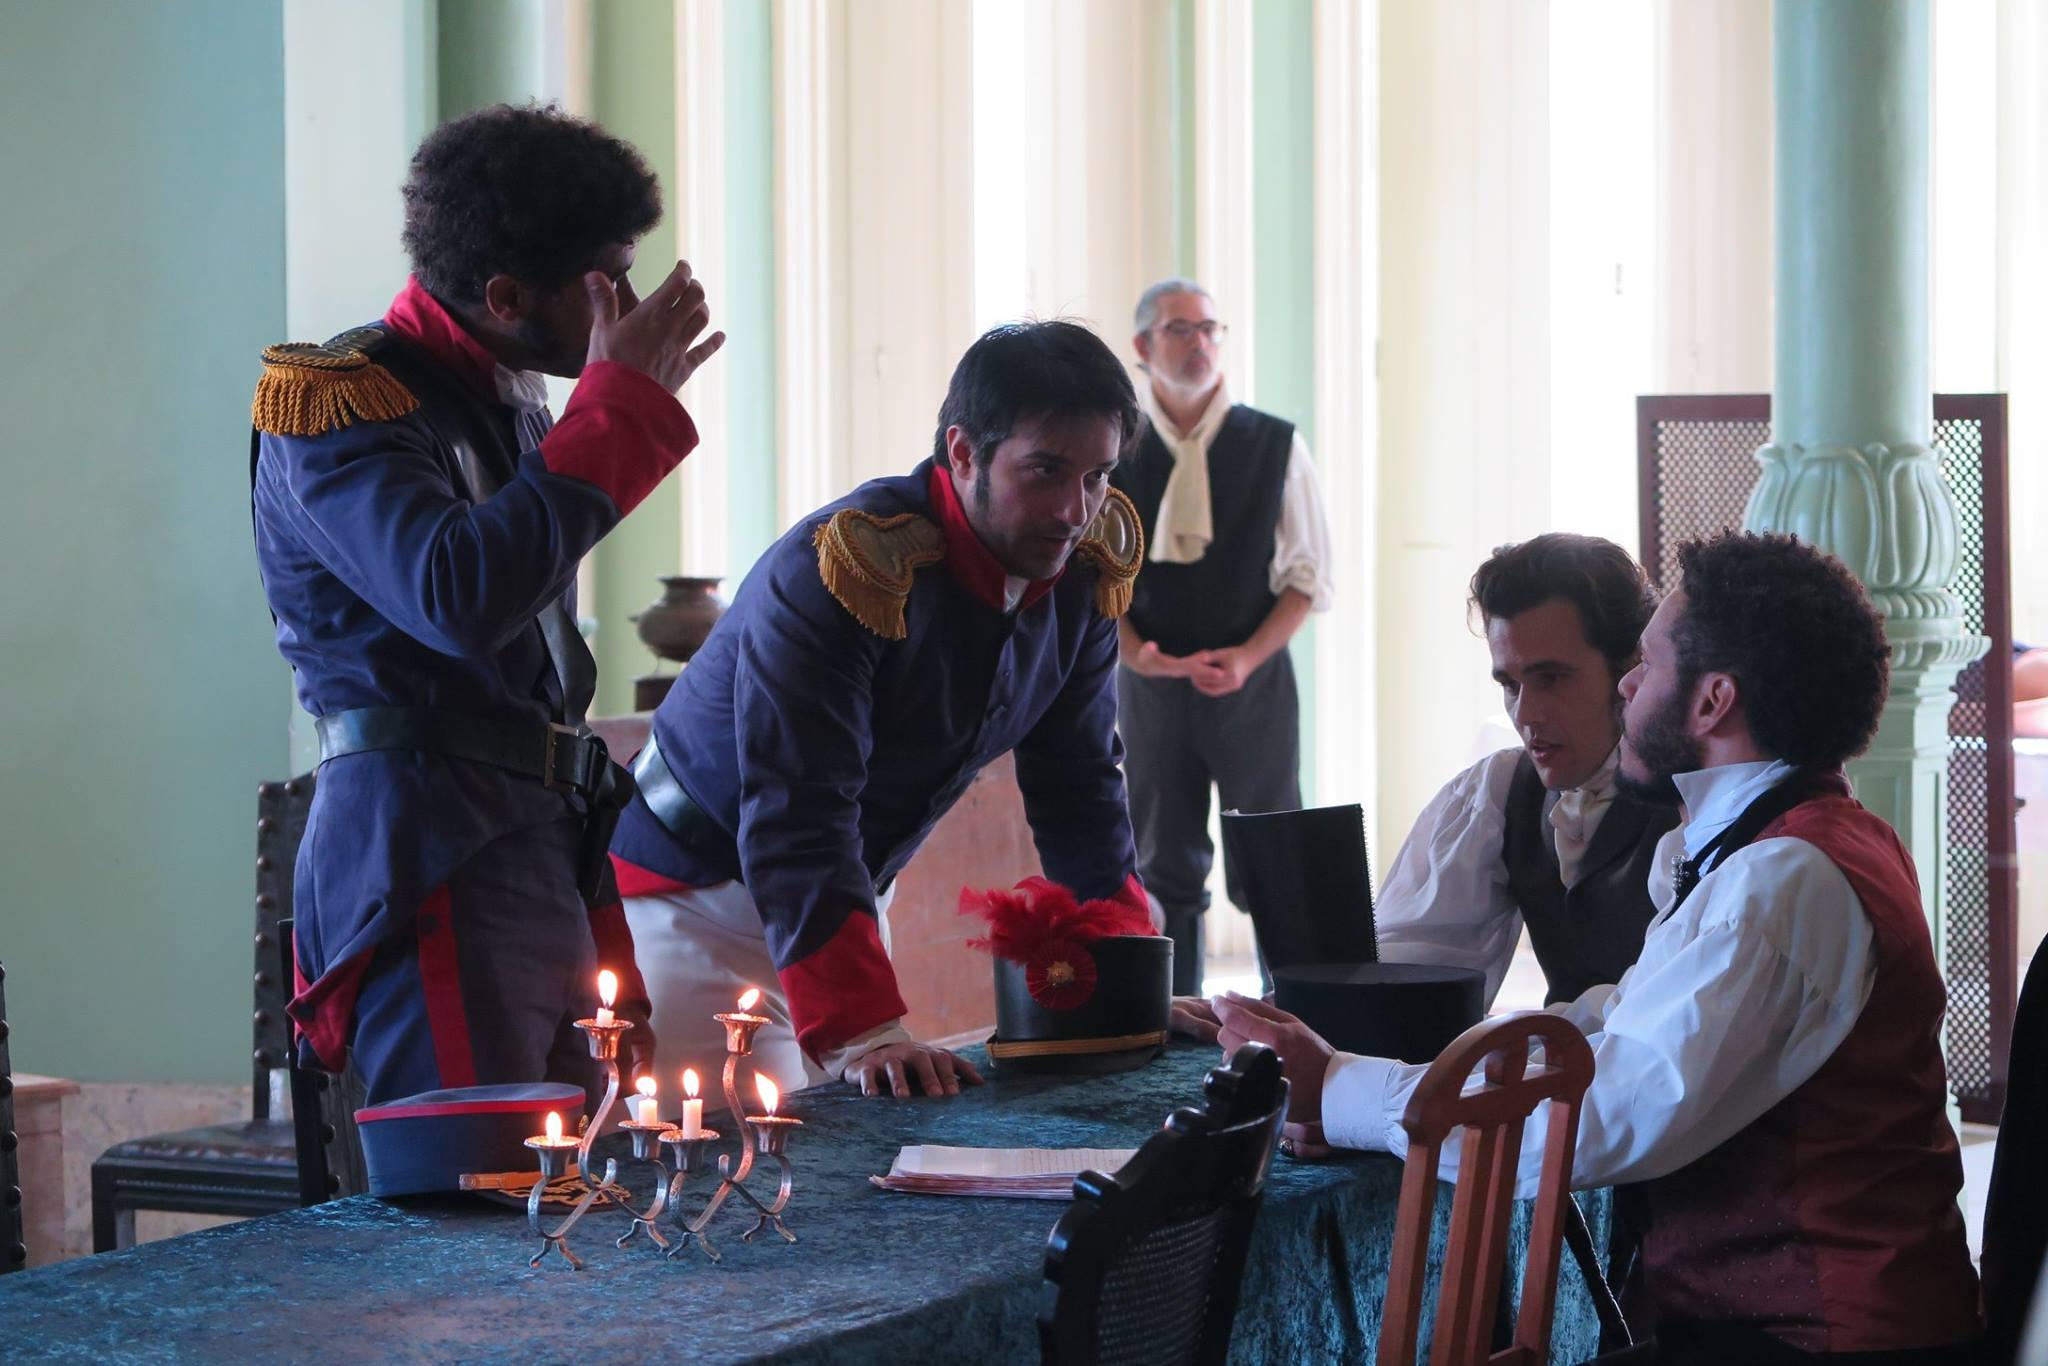 Bruno Ferrari, Domingos Antonio, and Arthur Canavarro in 1817: A revolução esquecida (2017)